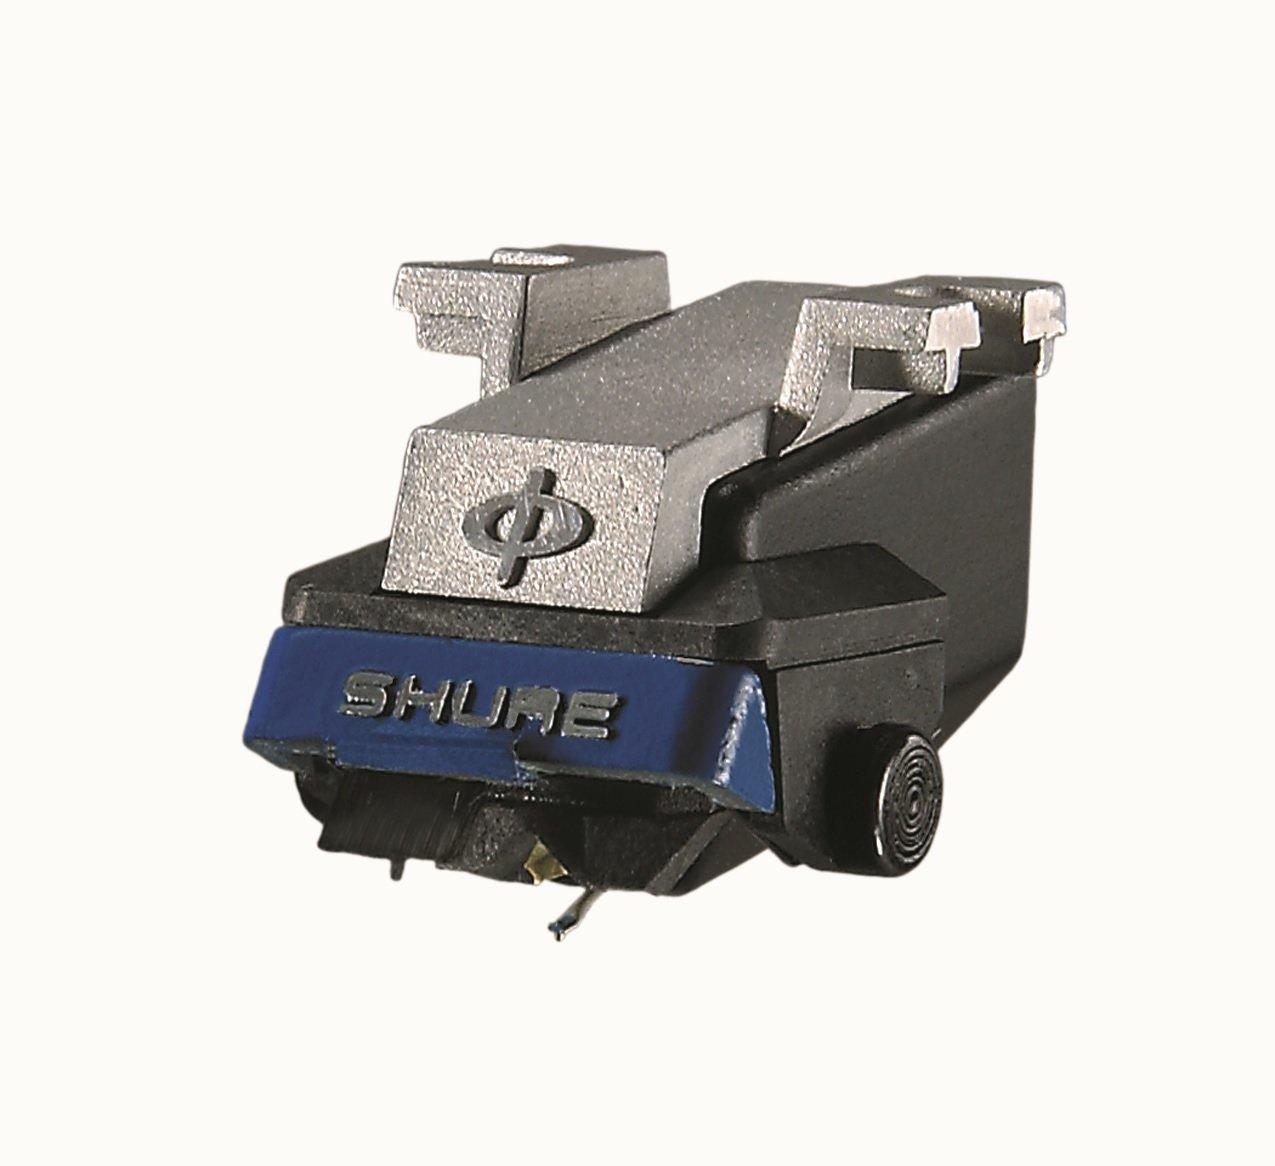 SHURE phono cartridge,SHURE phonograph cartridge